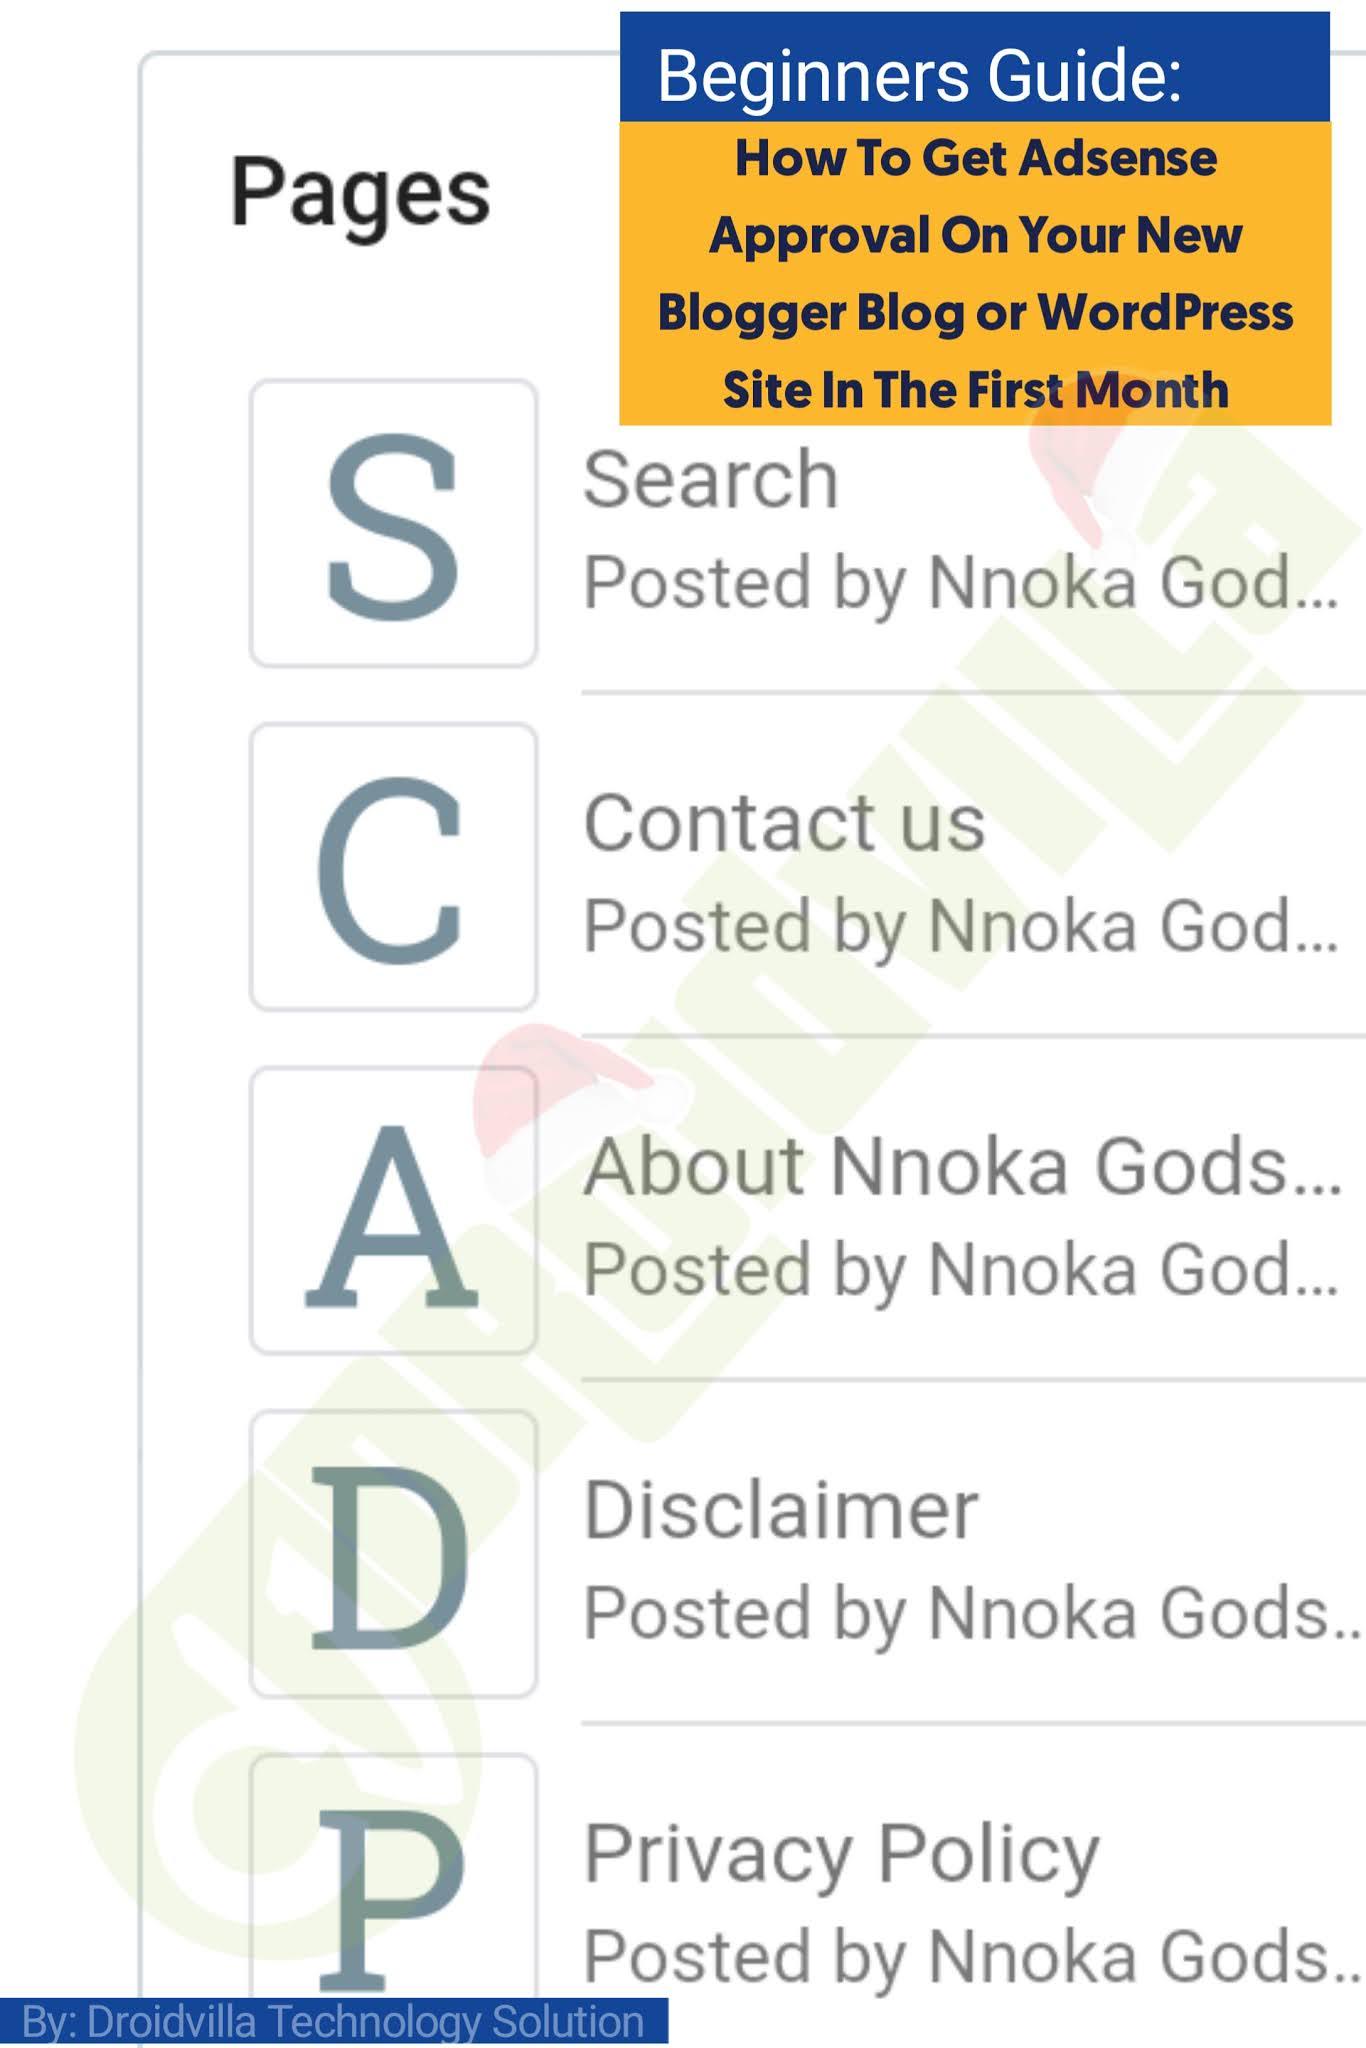 Adsense Google blogger blog